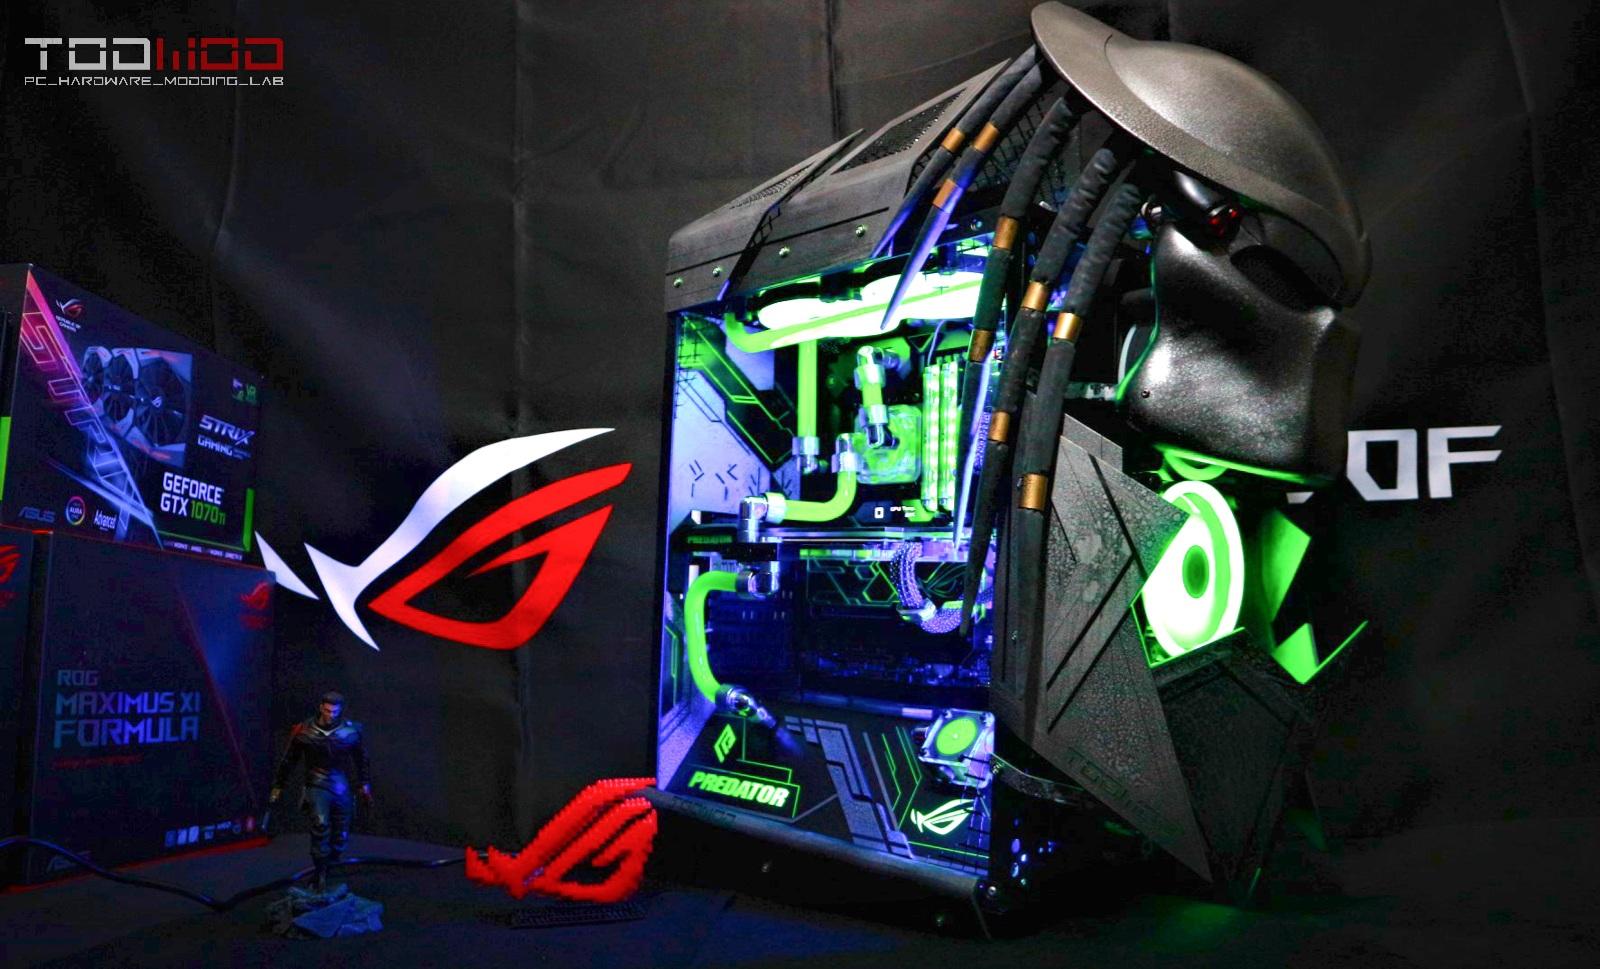 Predator Mod from TodMod